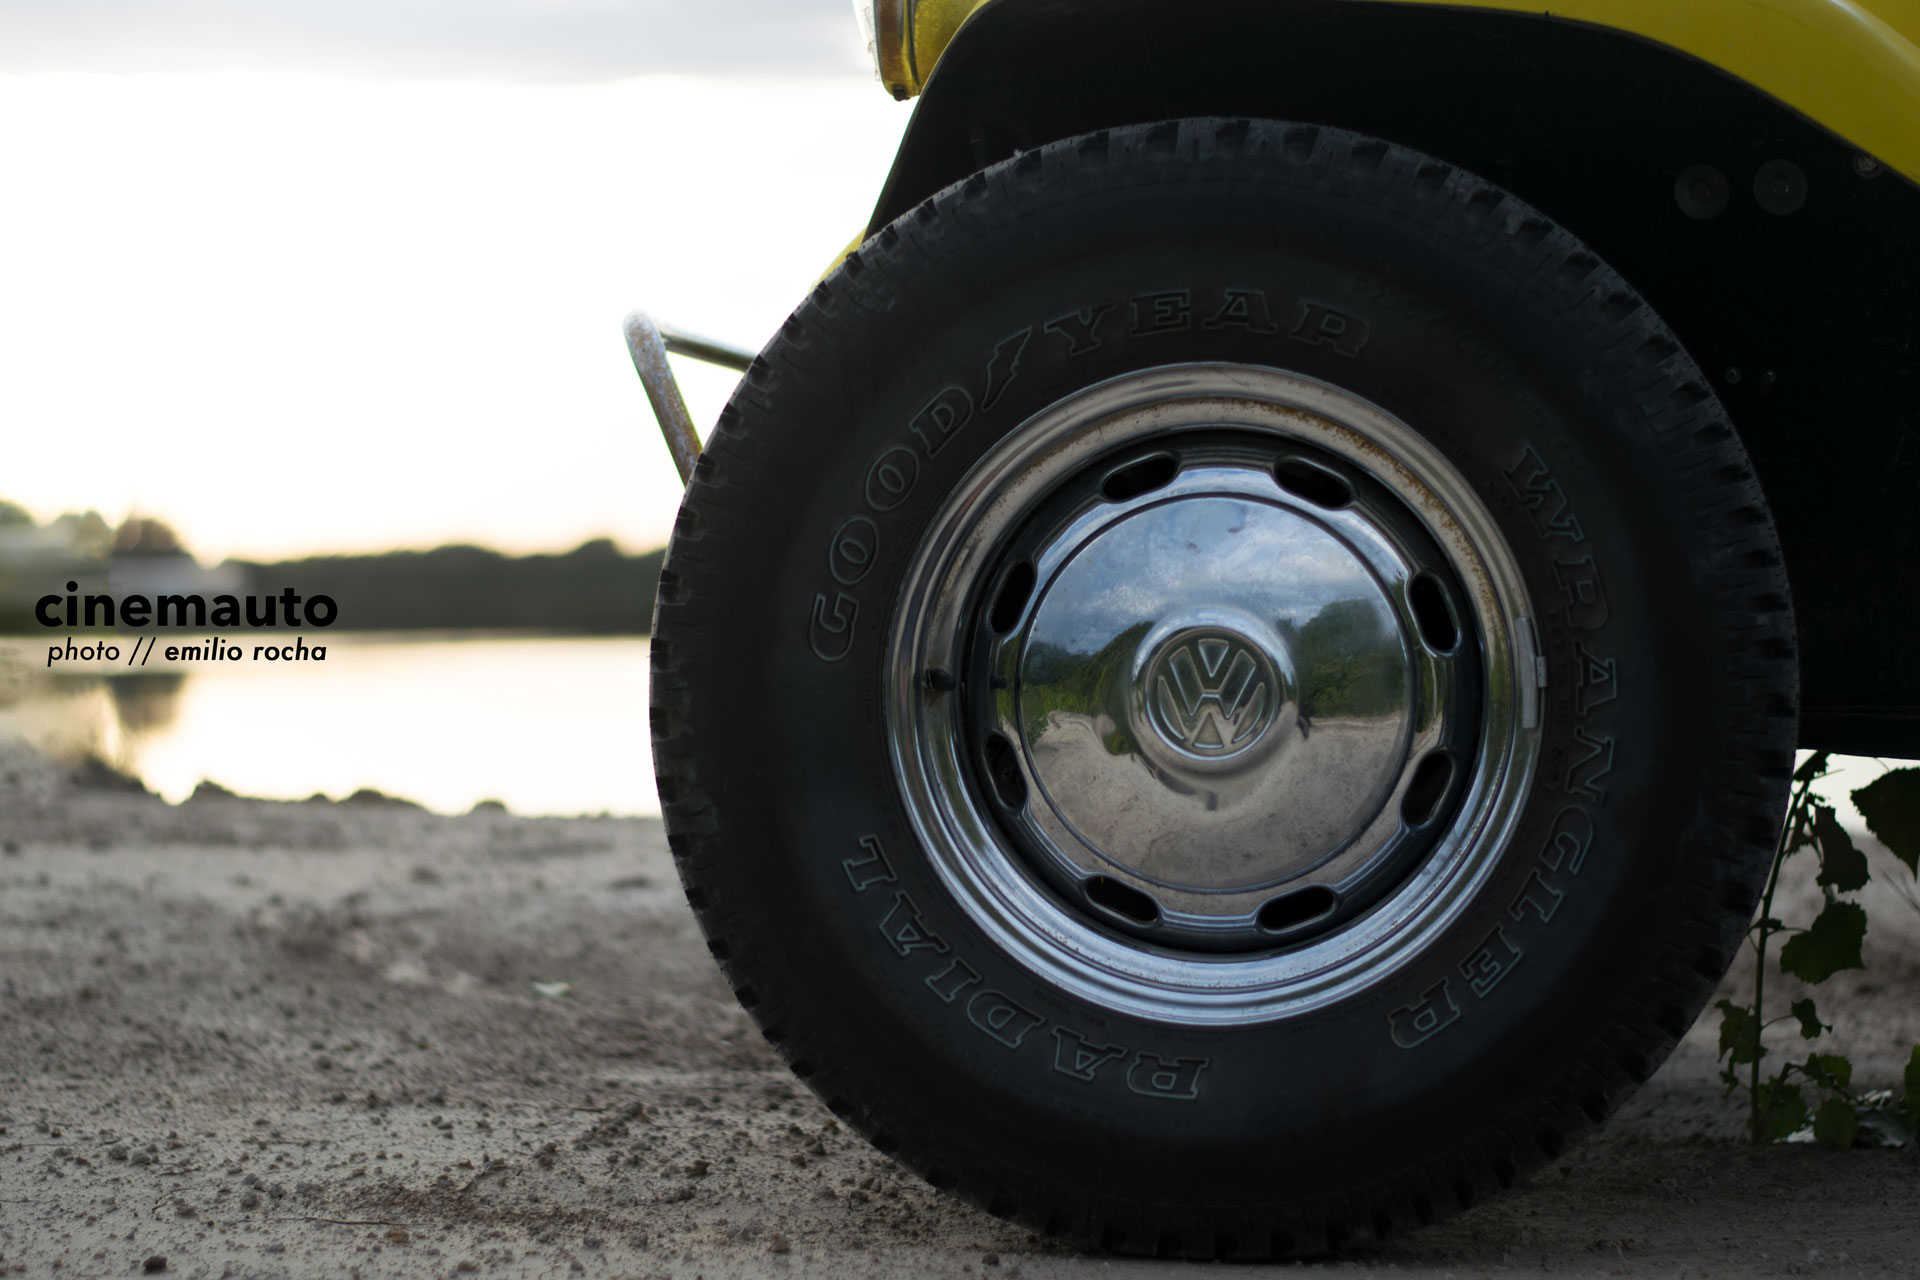 wichita-automotive-photography-cinemauto-gv7.jpg